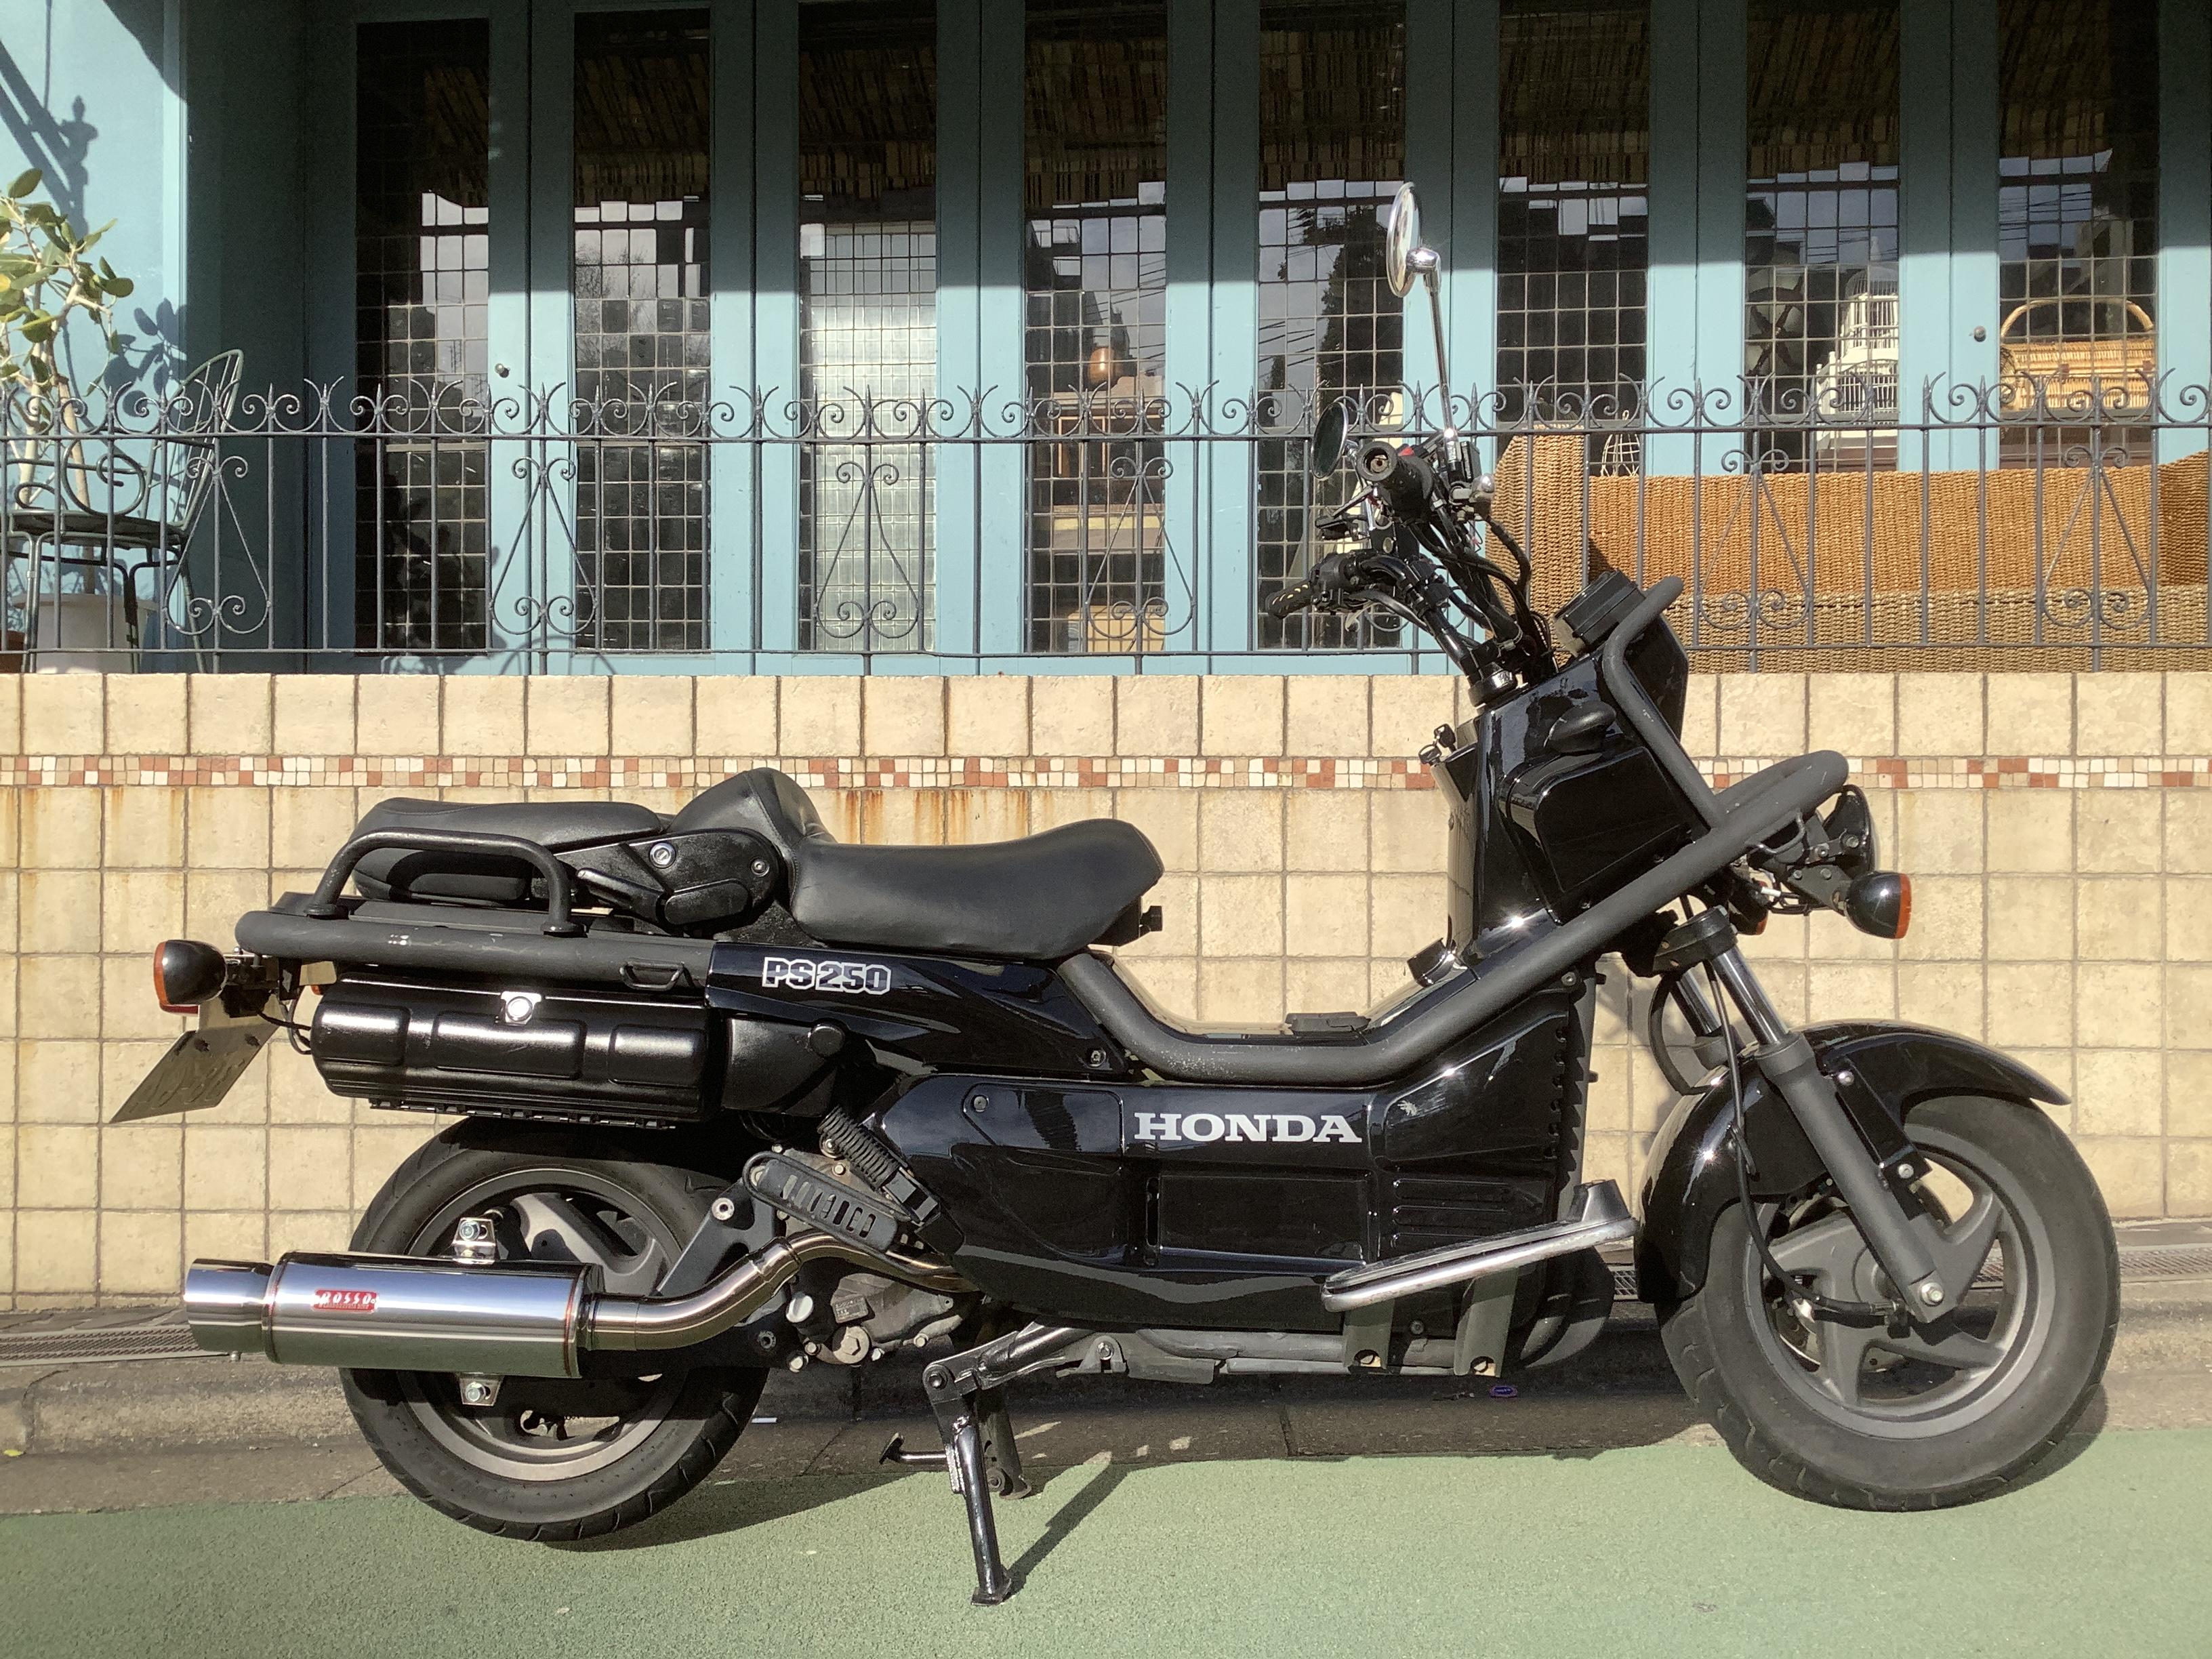 PS250 (HN-00) - 【公式】レンタルバイクのベストBike® 上野駅前